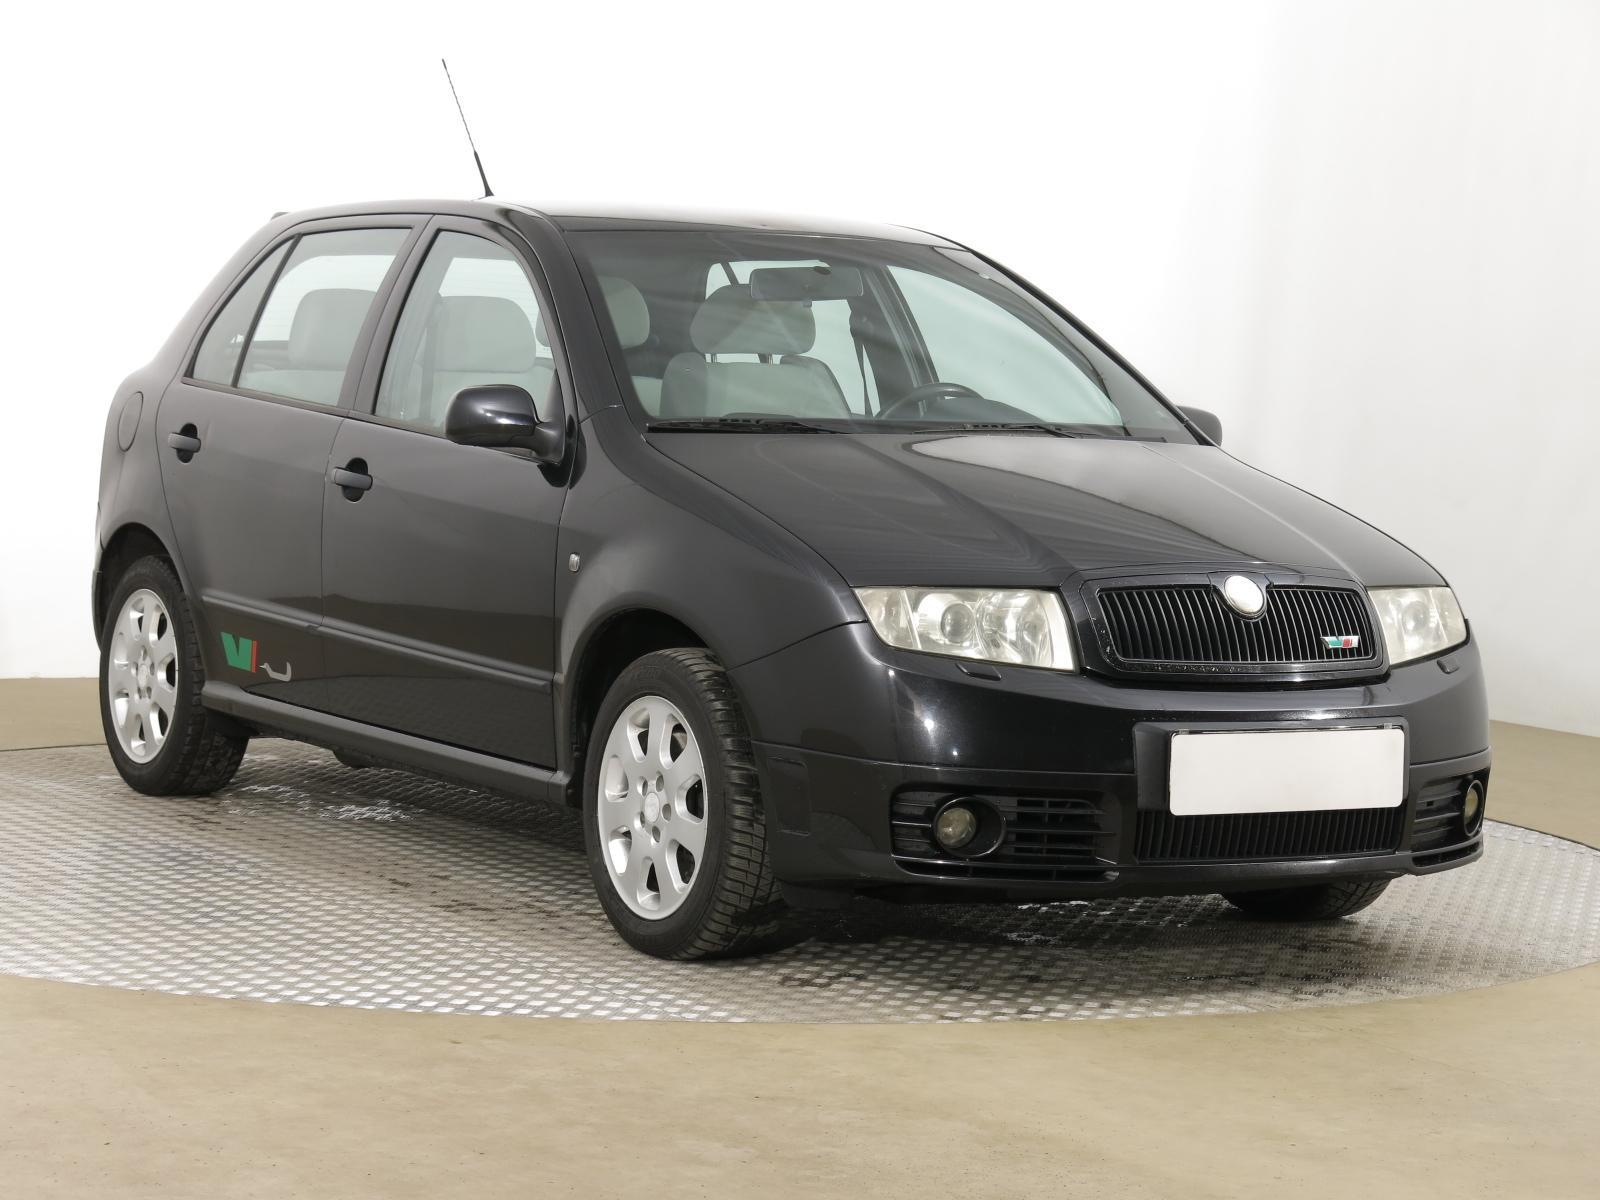 Škoda Fabia RS 1.9 TDI 96kW hatchback nafta